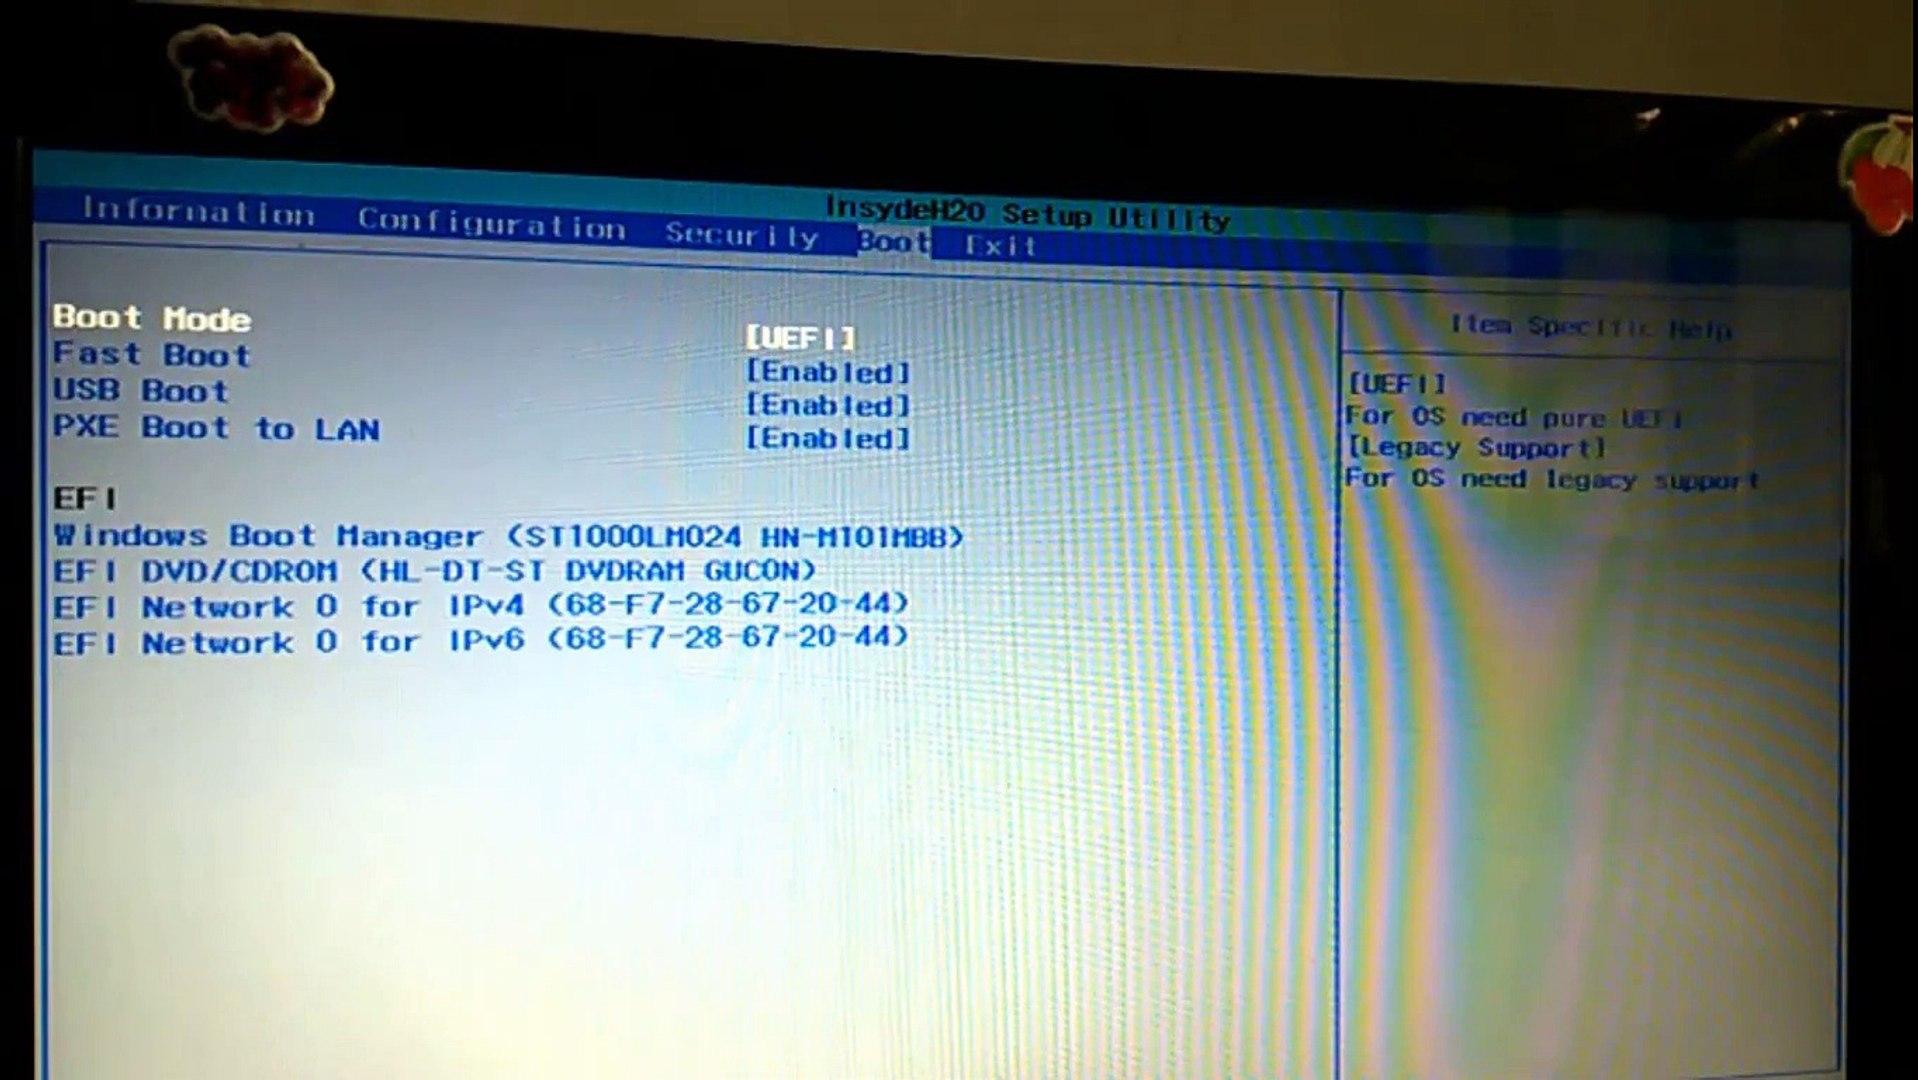 Clean Install windows 10/8 1 with cd/usb, Bios setup HD